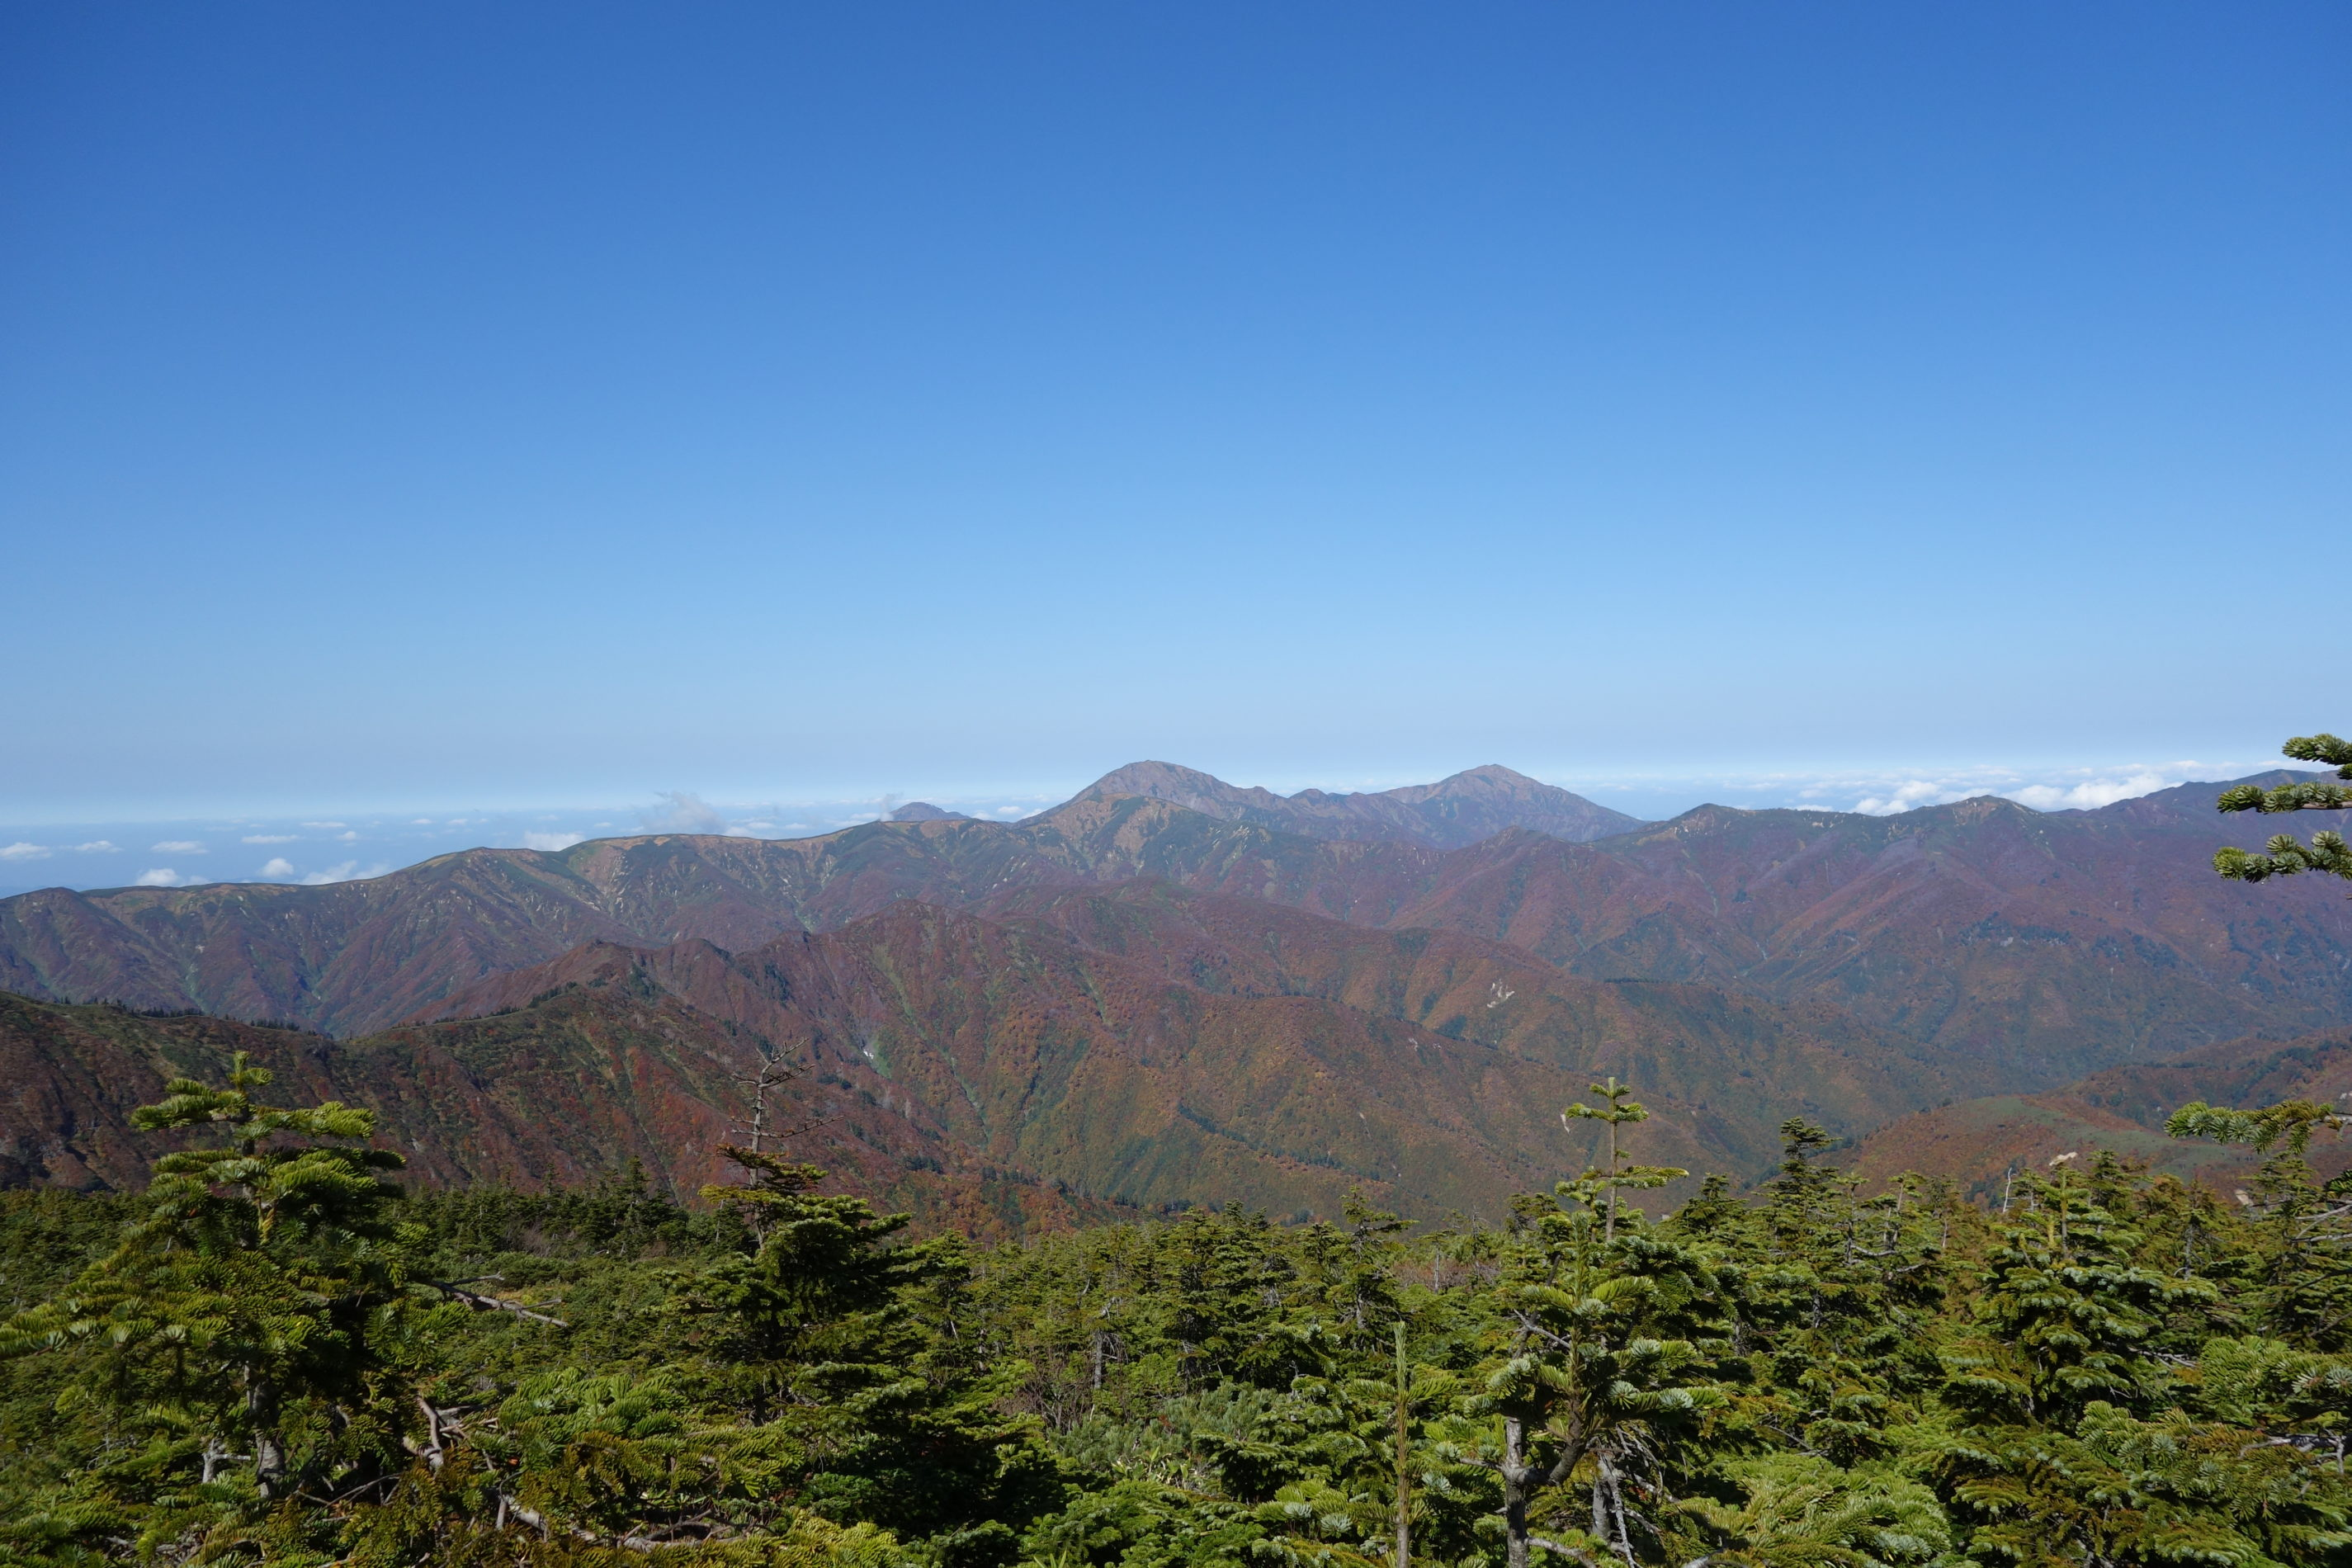 平ヶ岳 平ヶ岳山頂〜玉子石